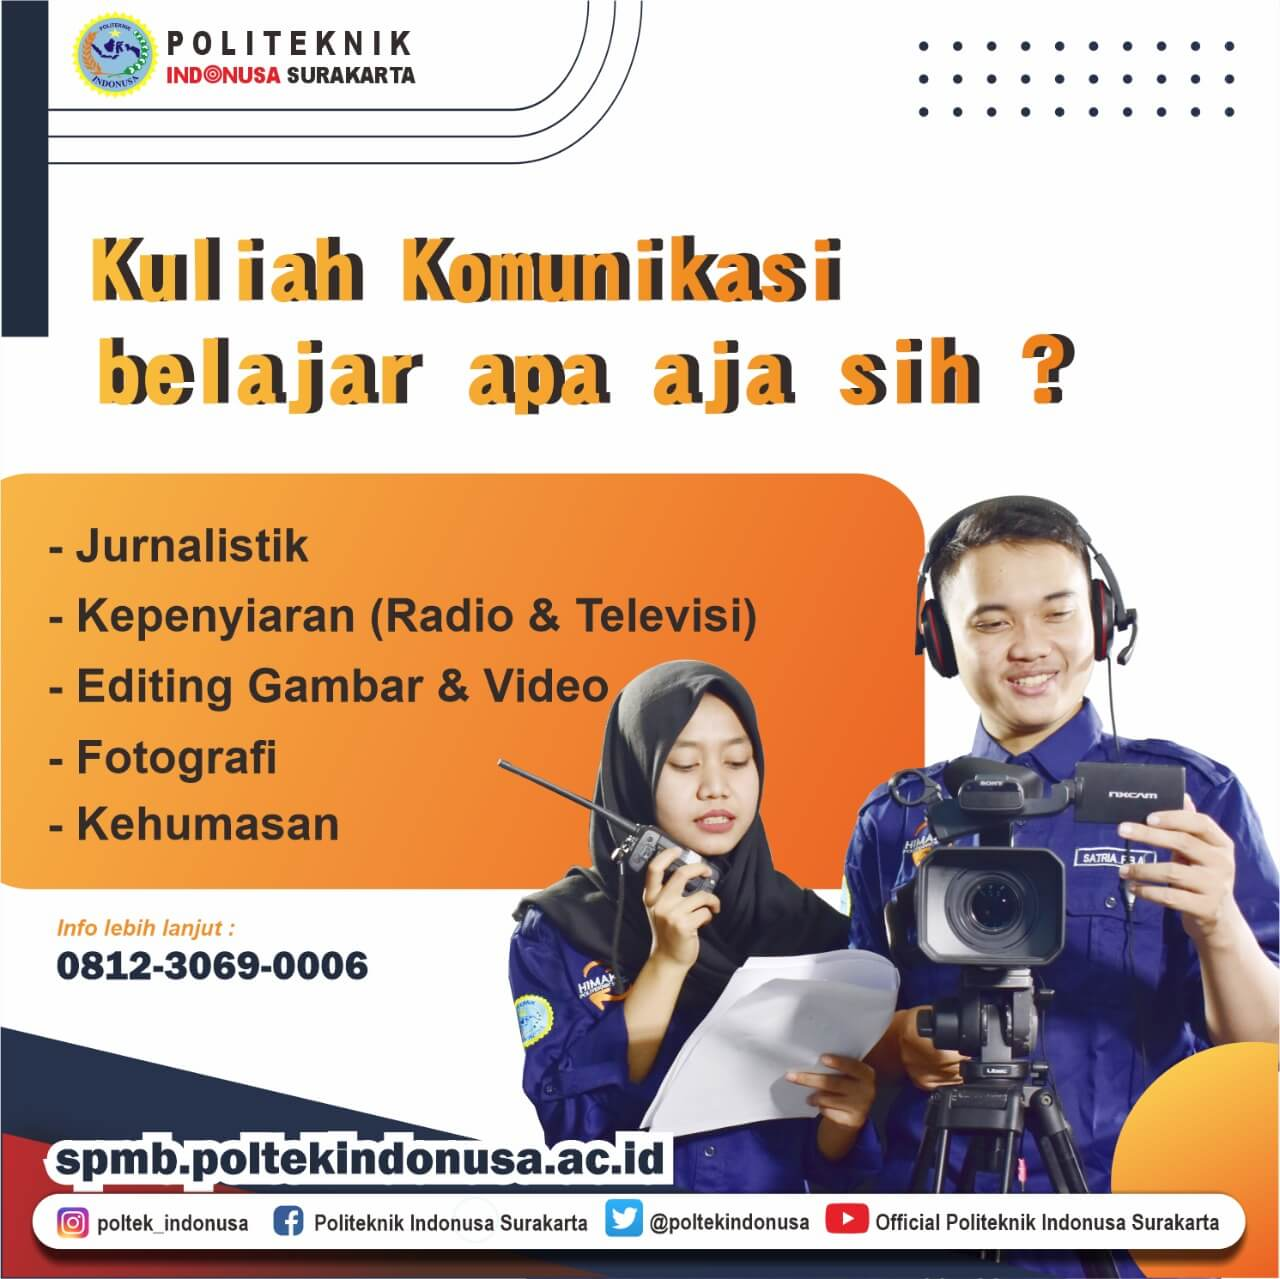 Program Studi D3 Komunikasi Massa Politeknik Indonusa Surakarta